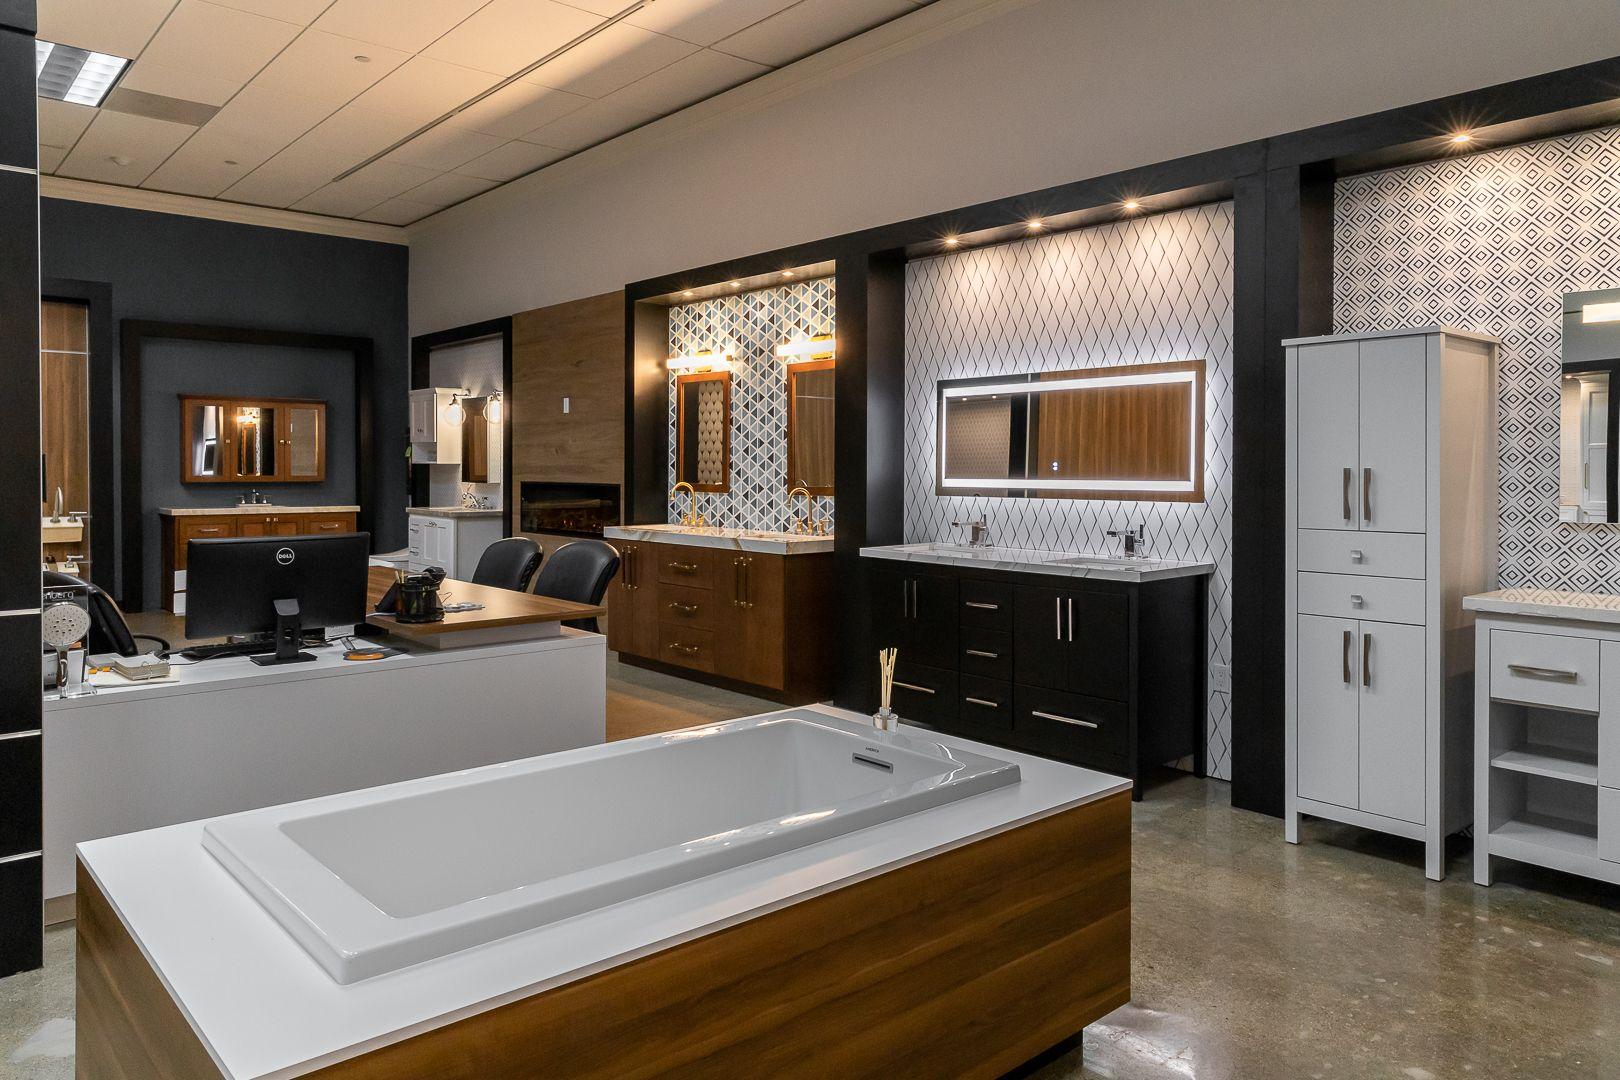 Kitchen And Bath Showroom Kitchen And Bath Showroom Kitchen And Bath Kitchen Tops